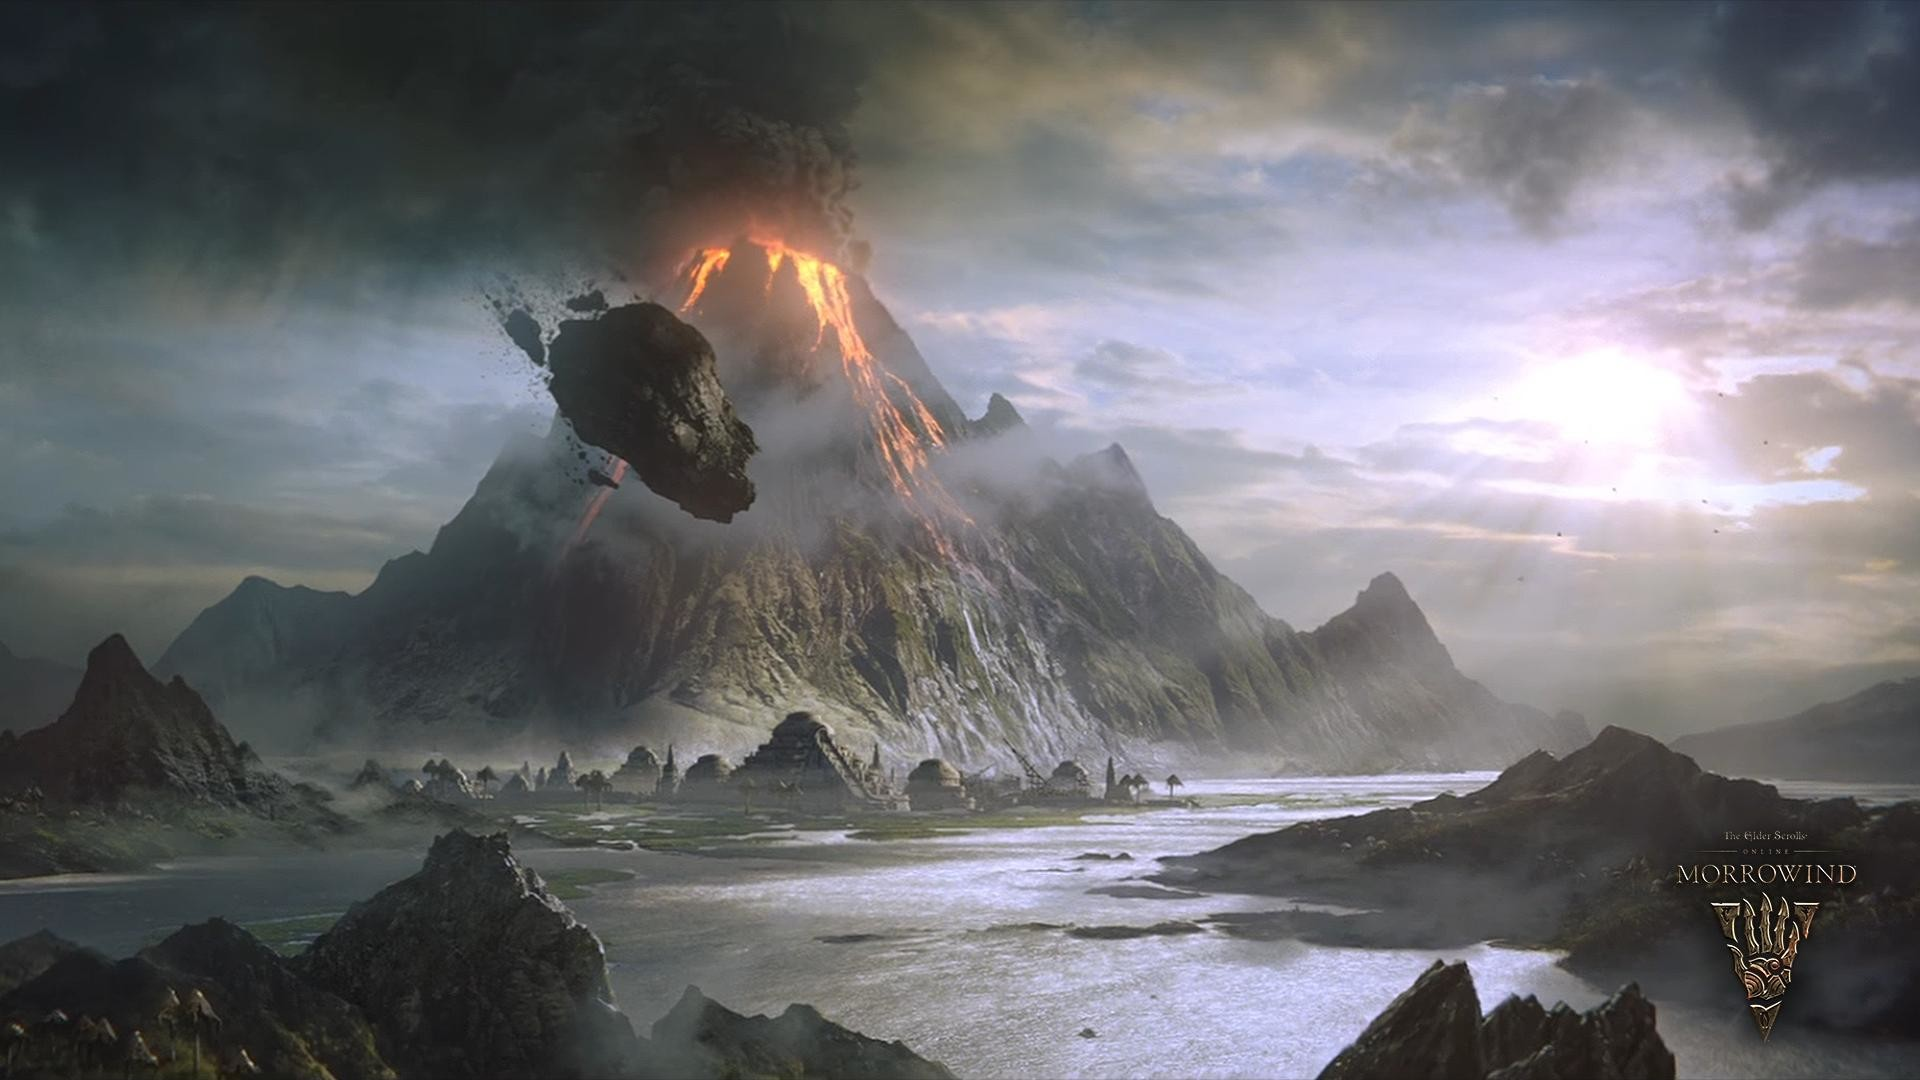 Morrowind wallpapers 76 images - Morrowind wallpaper ...